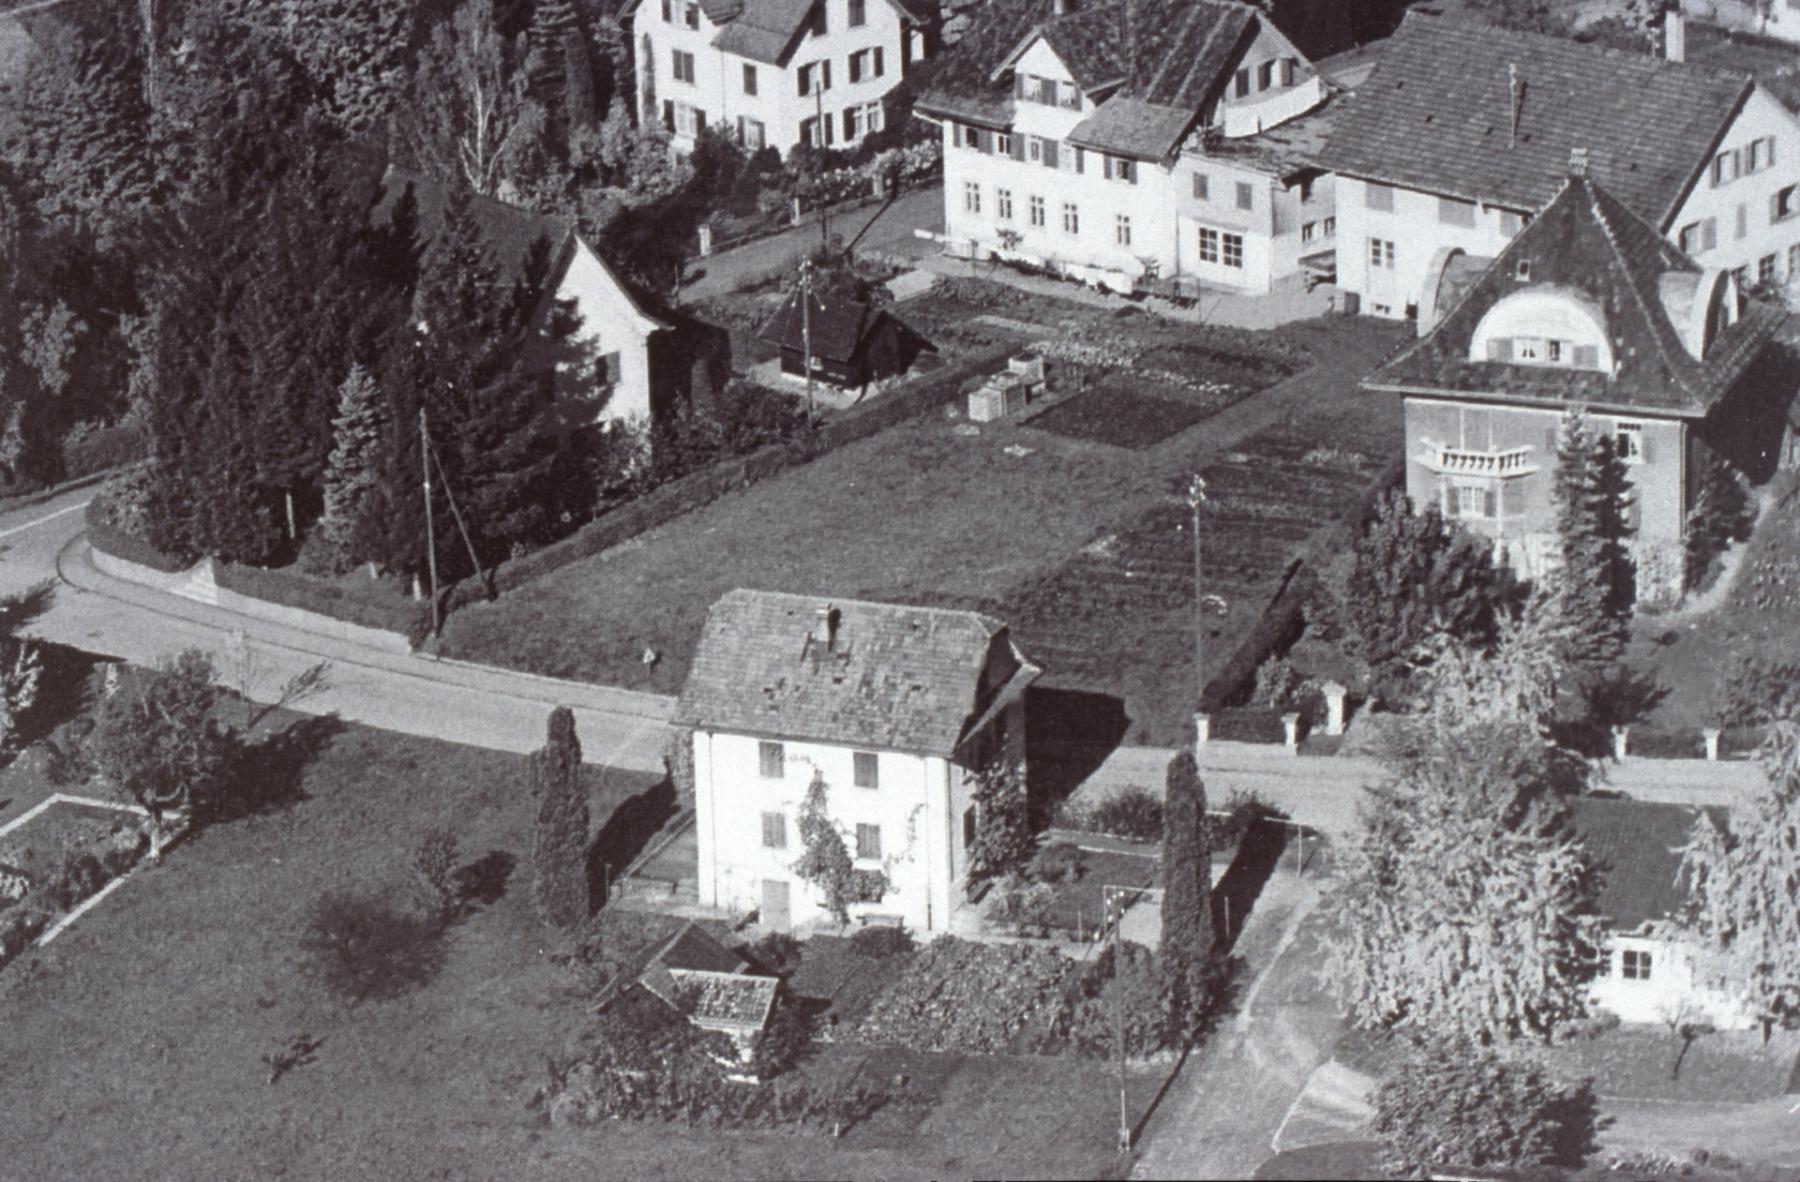 Güetli (erbaut 1921), Rotes Haus, Kantonalbank, ca 1950